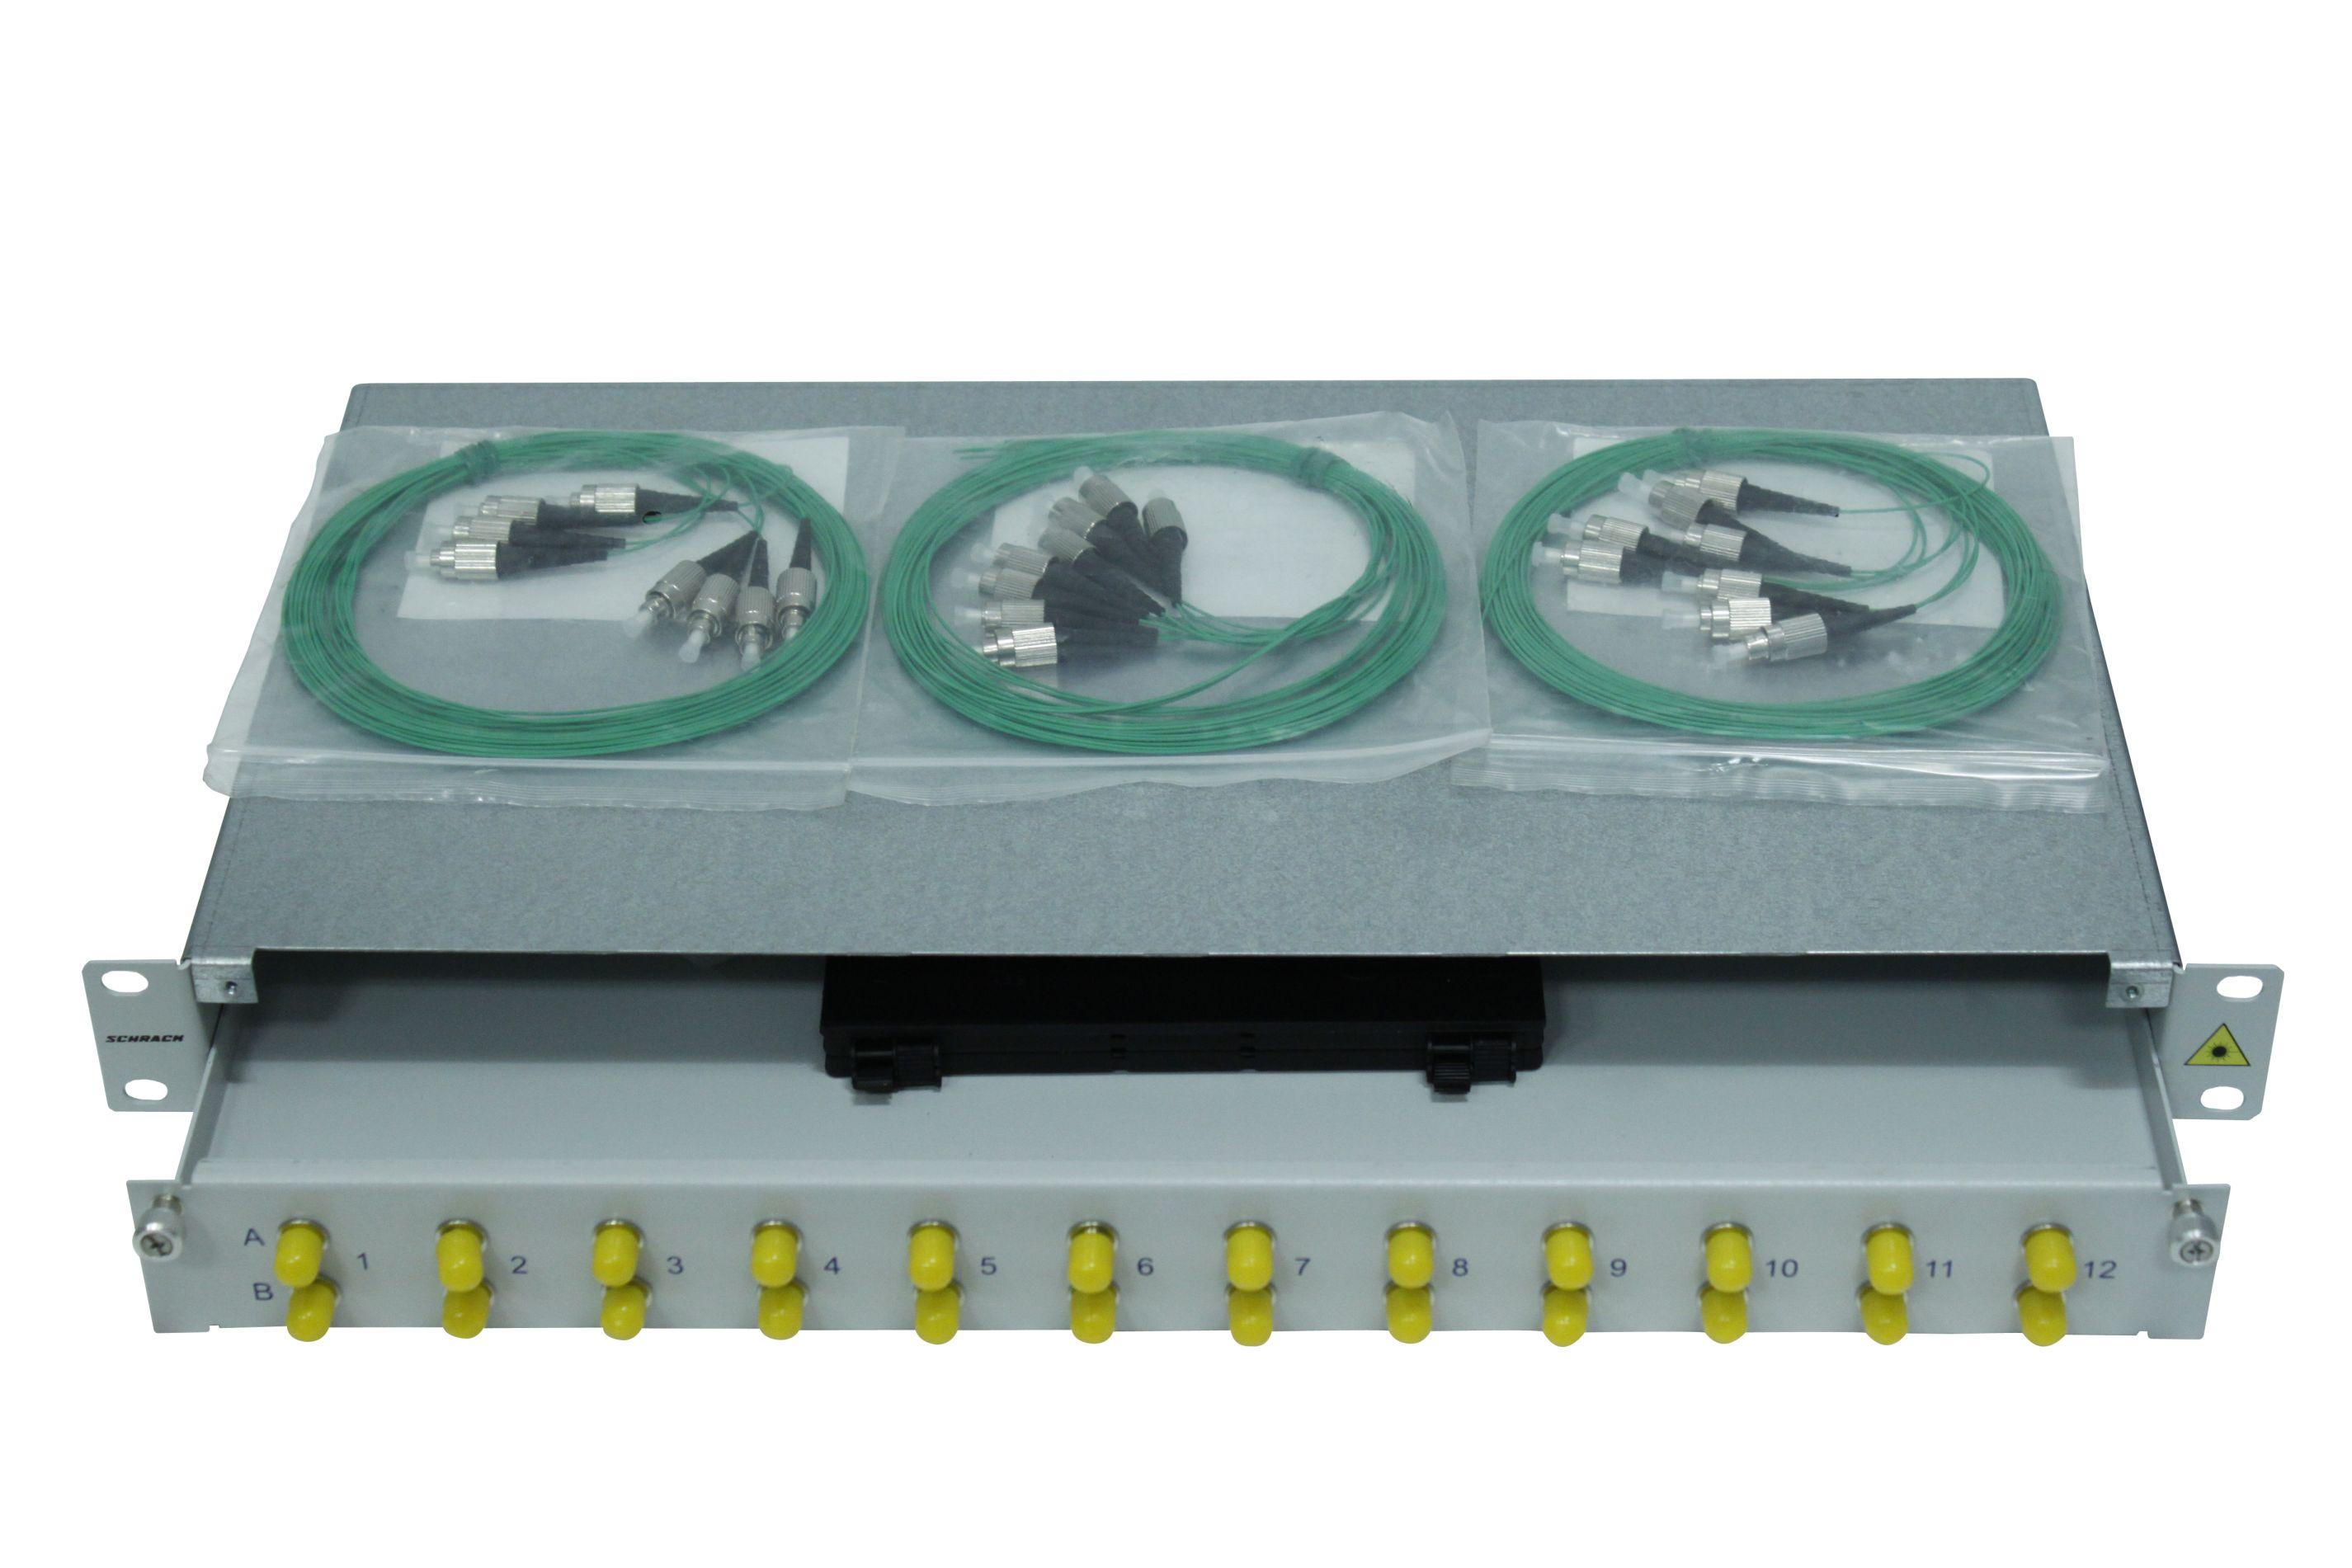 1 Stk LWL Spleißbox,24Fasern,FC, 9/125µm OS2, ausziehbar,19,1HE HSELS249FG